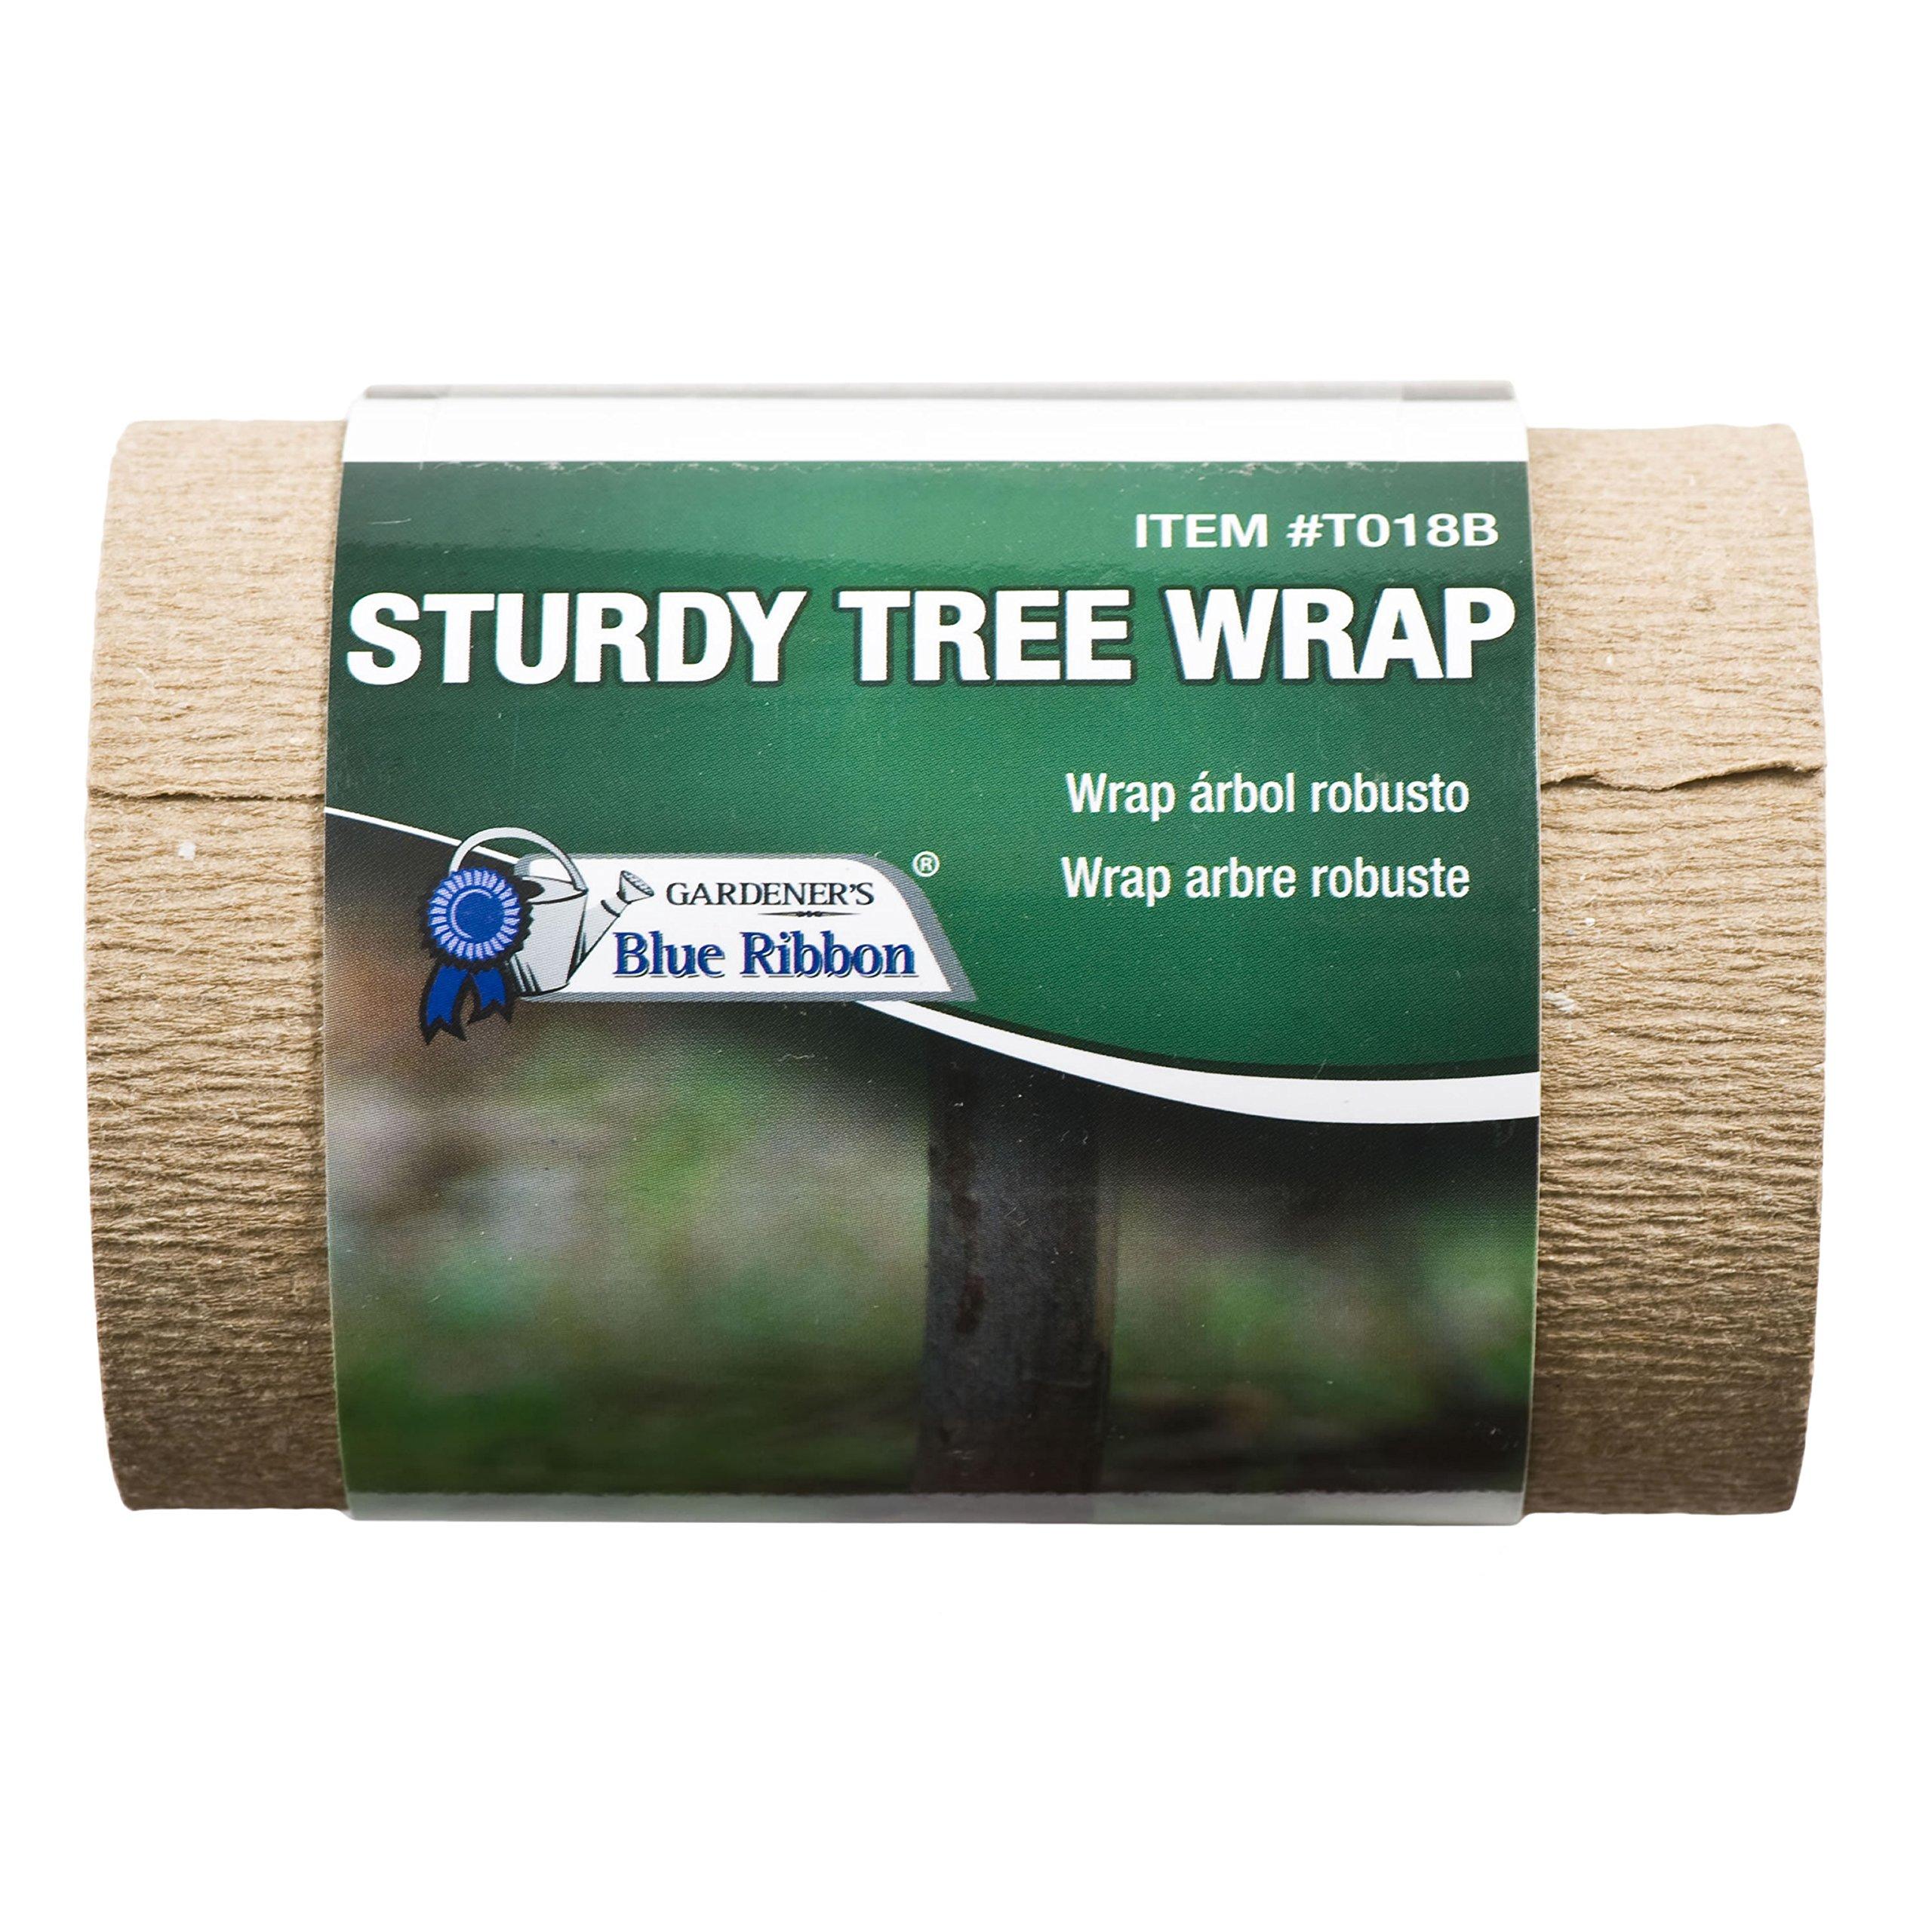 Gardener's Blue Ribbon T018B Tree Wrap